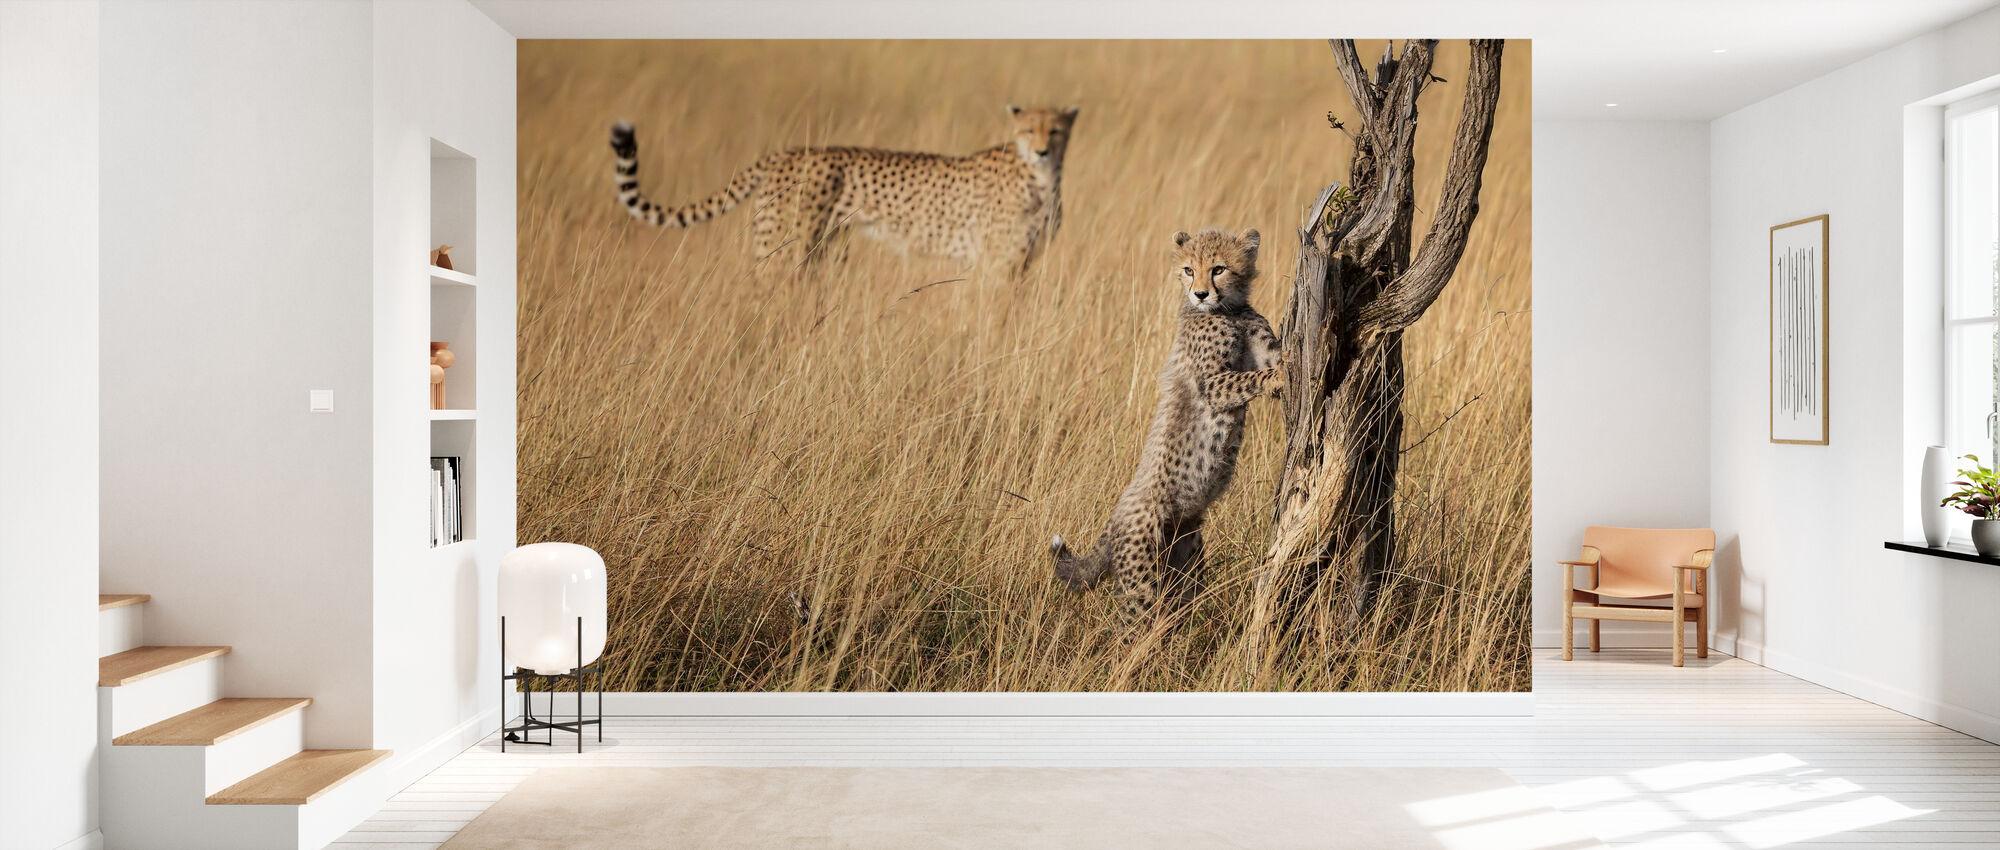 I've Got it Mum - Wallpaper - Hallway